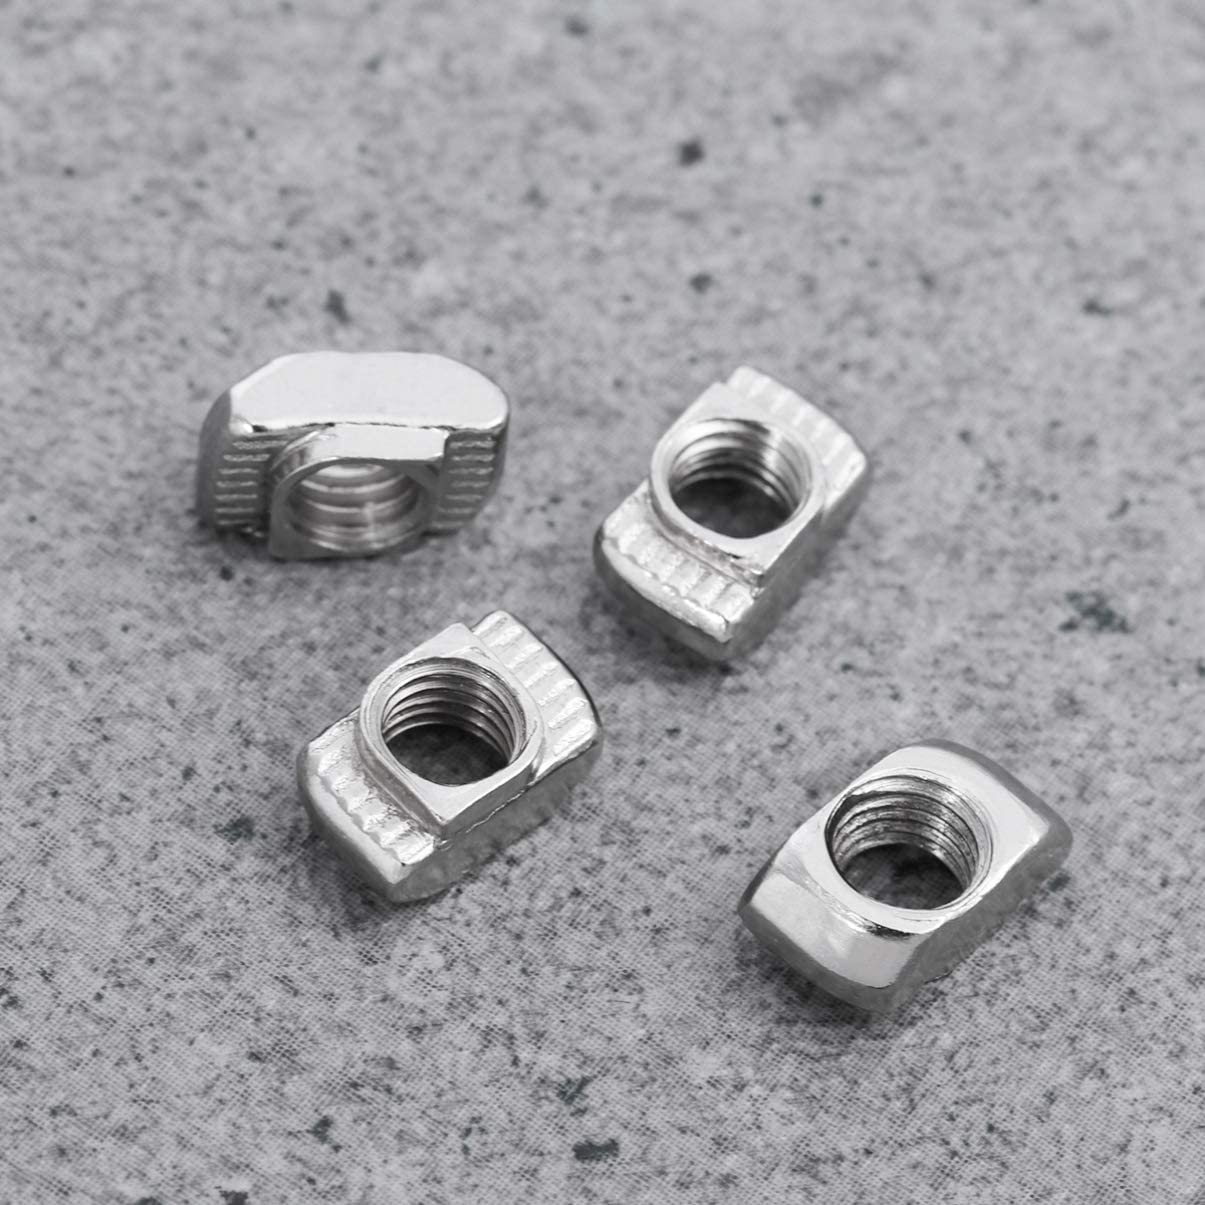 M4x10x6 UKCOCO 100PCS Carbon M4 T-Nuts Aluminum T-Nut European T-Nut